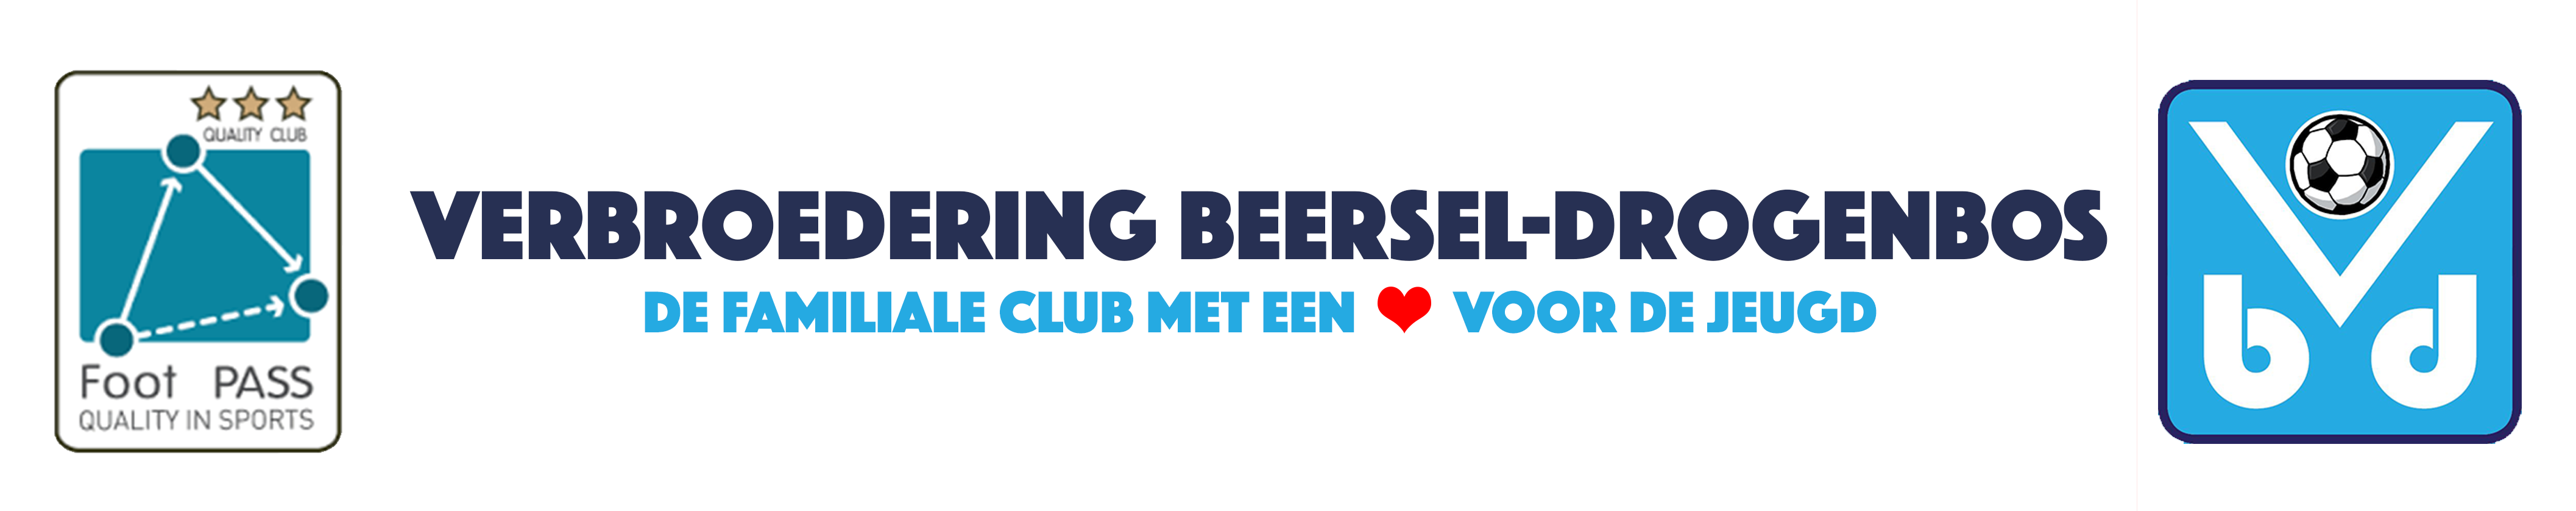 Verbroedering Beersel-Drogenbos